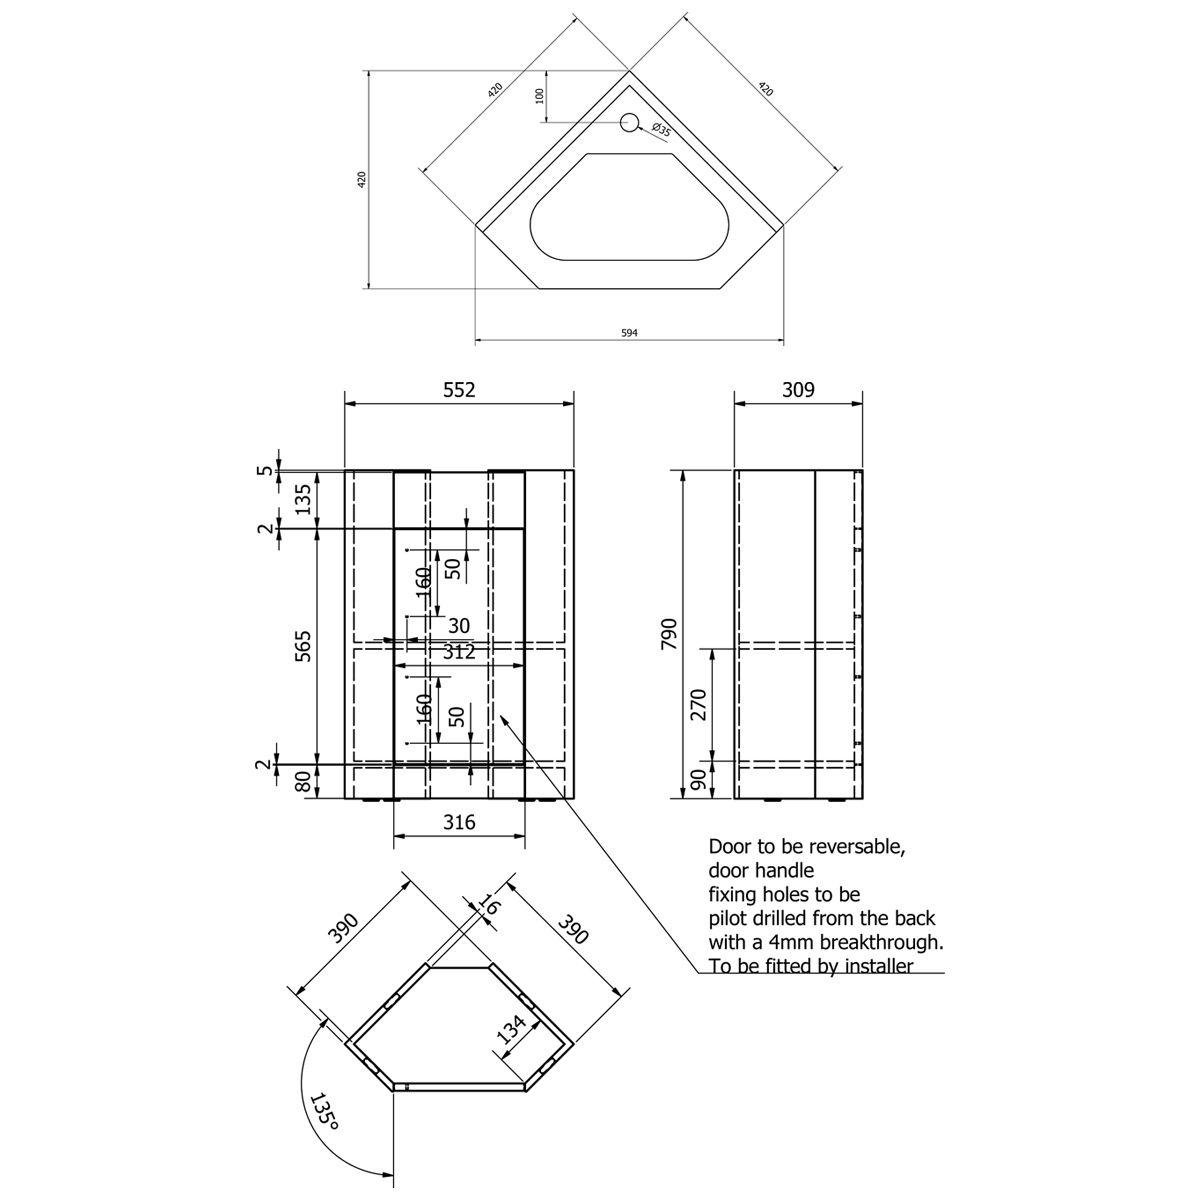 Kartell Impakt Corner Vanity Unit Dimensions